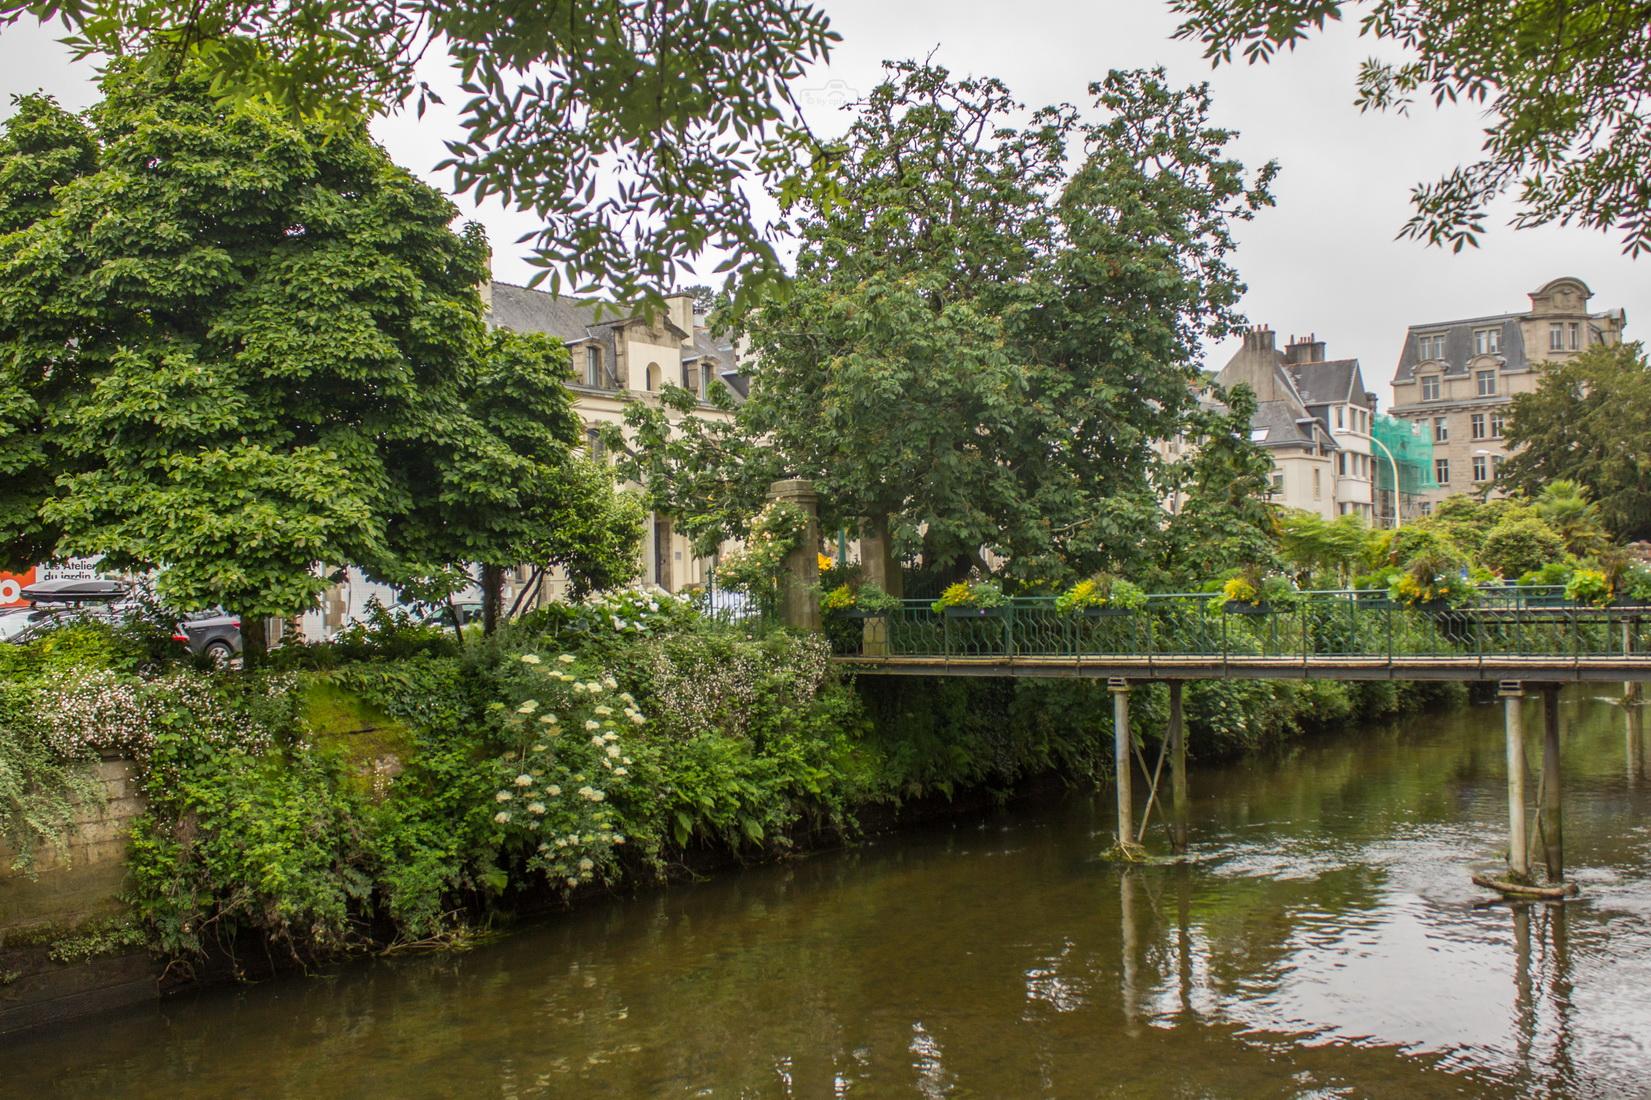 Quimper ist die Hauptstadt des Département Finistère in der Bretagne